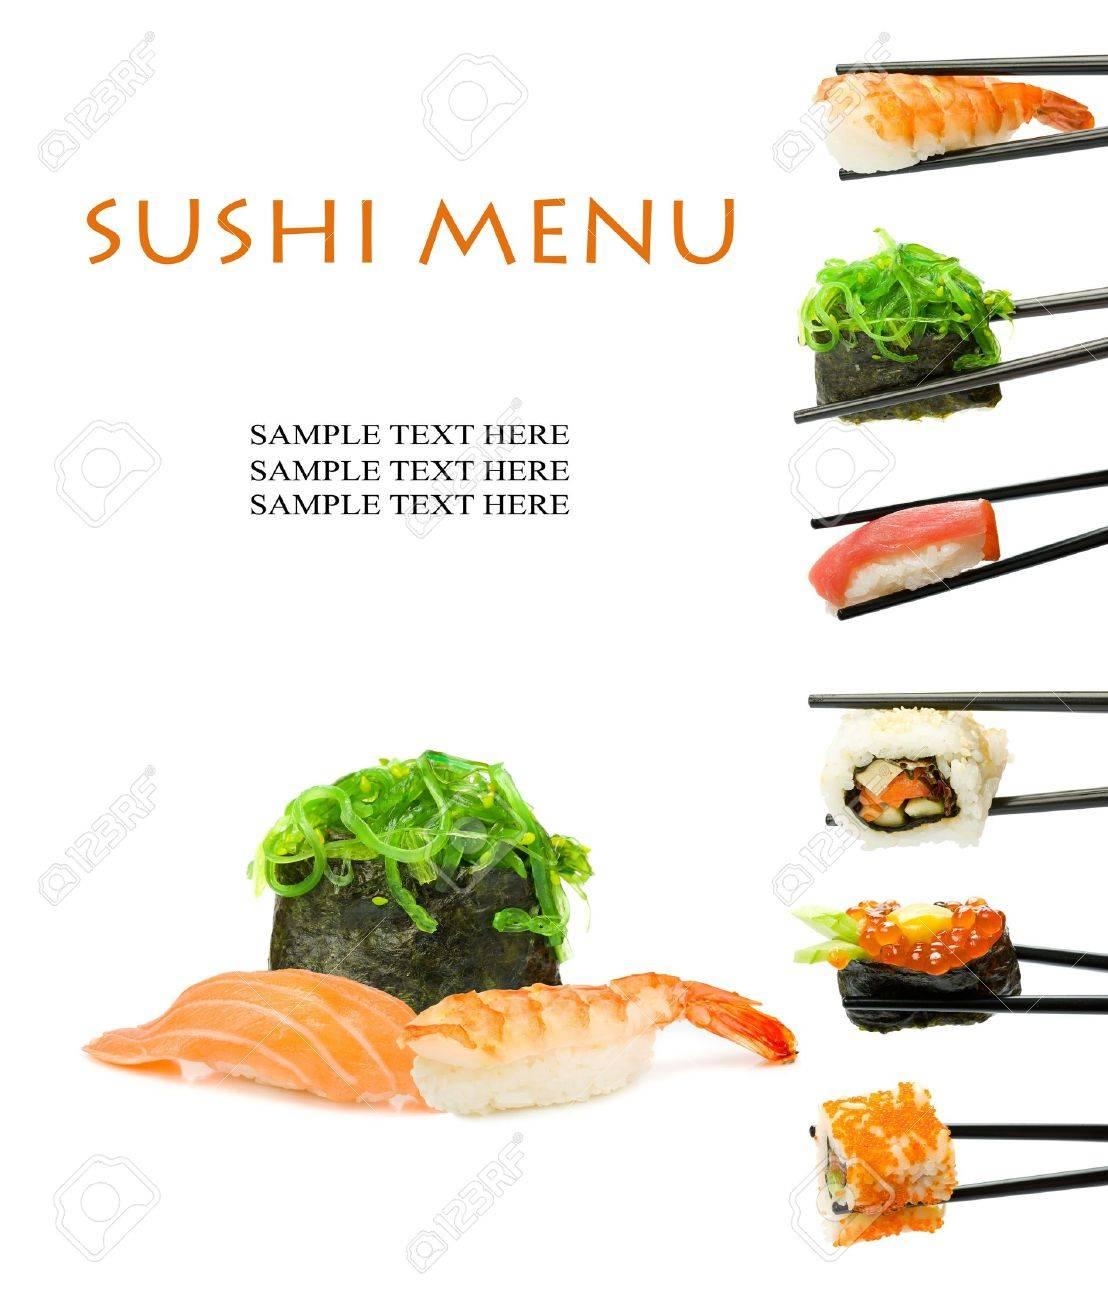 Sushi menu - 10627072